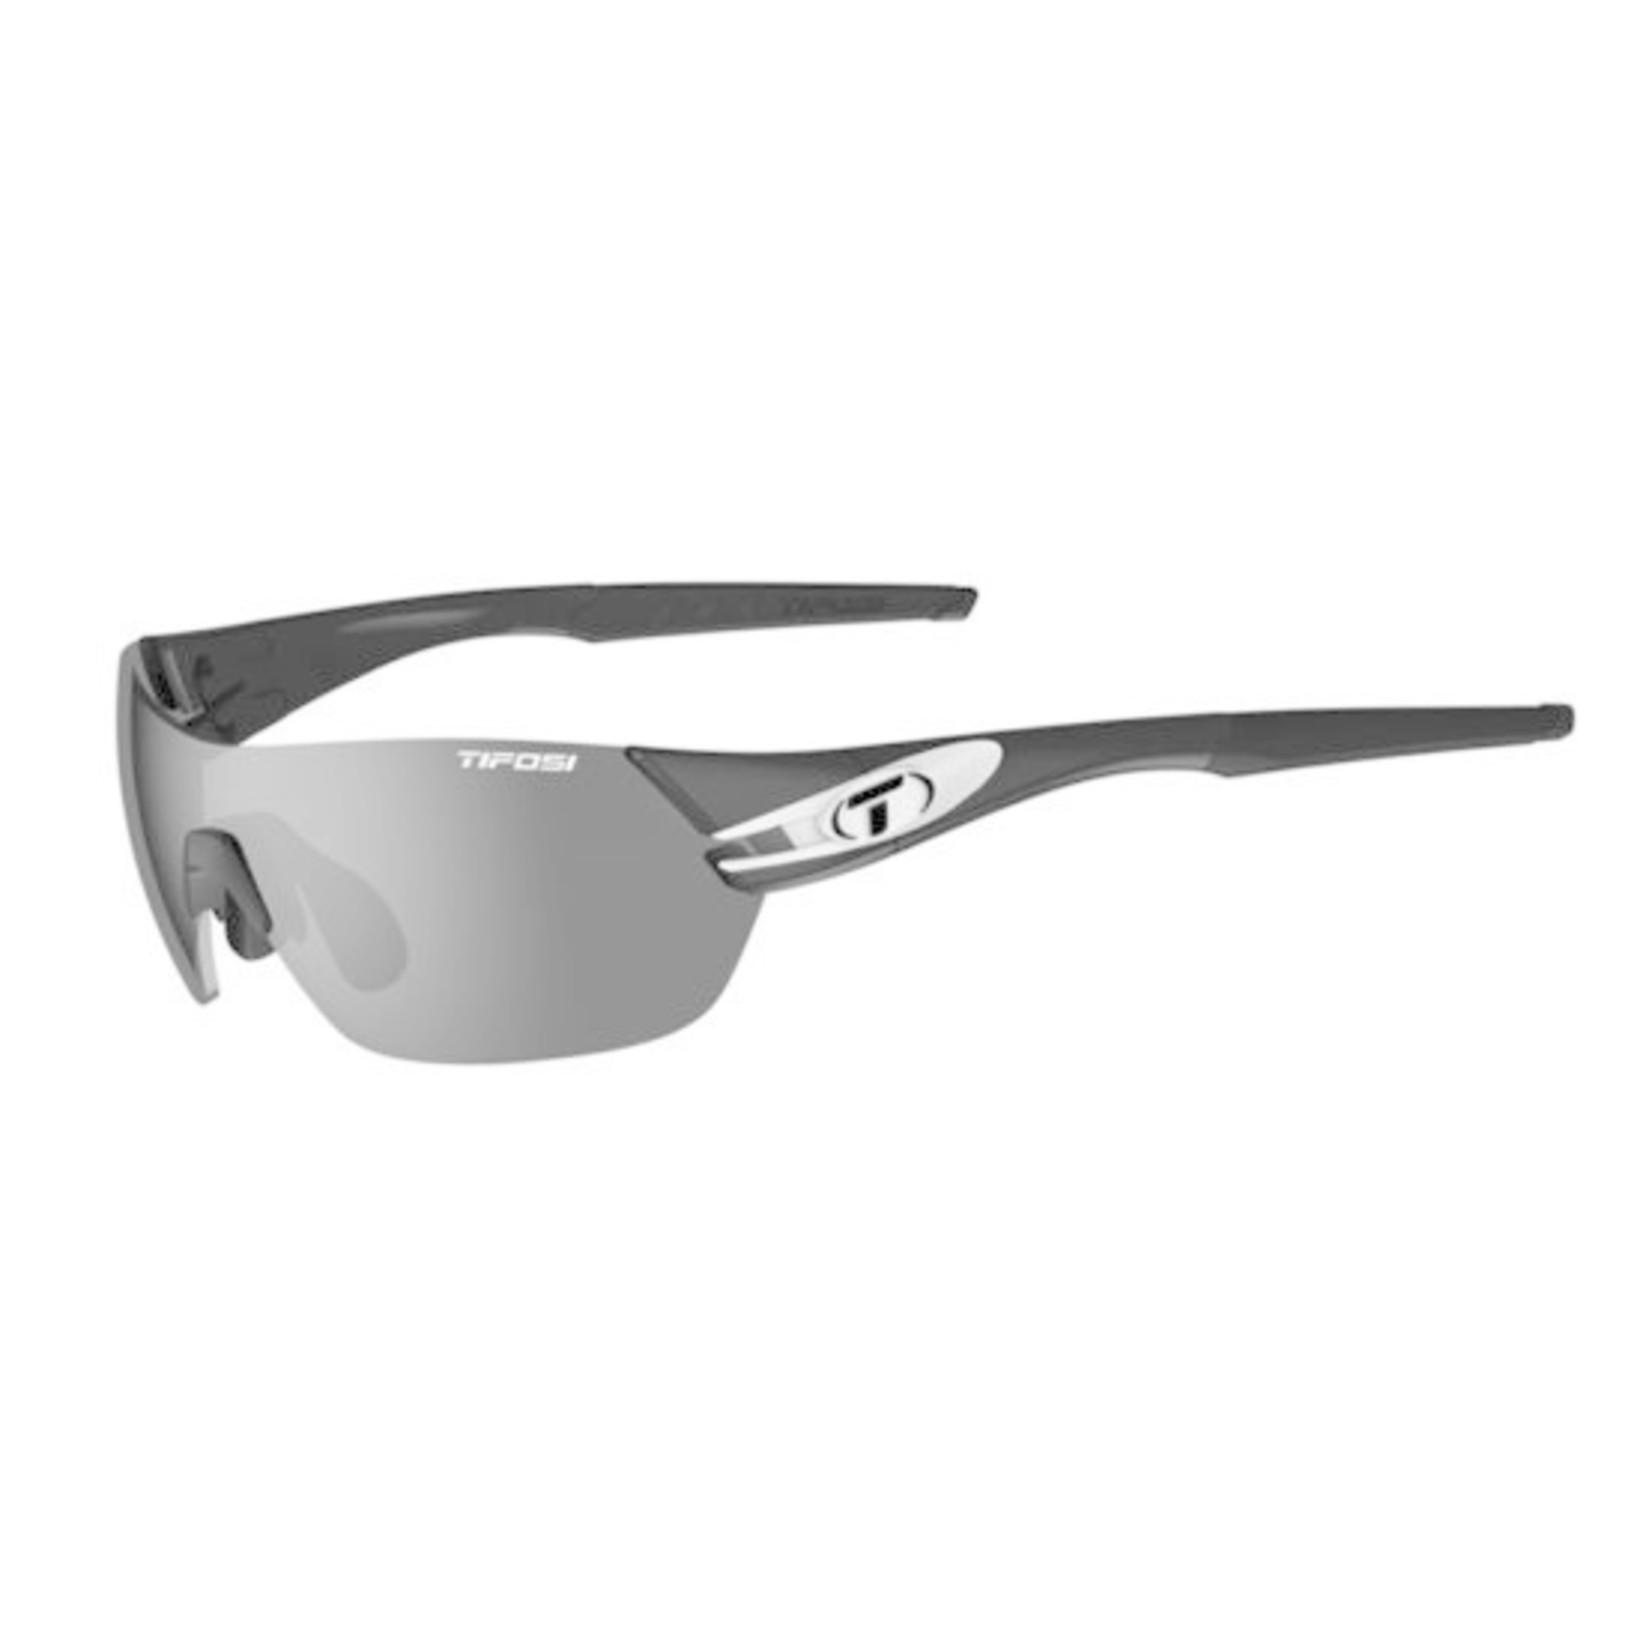 Tifosi Optics Slice, Black/White Fototec Sunglasses